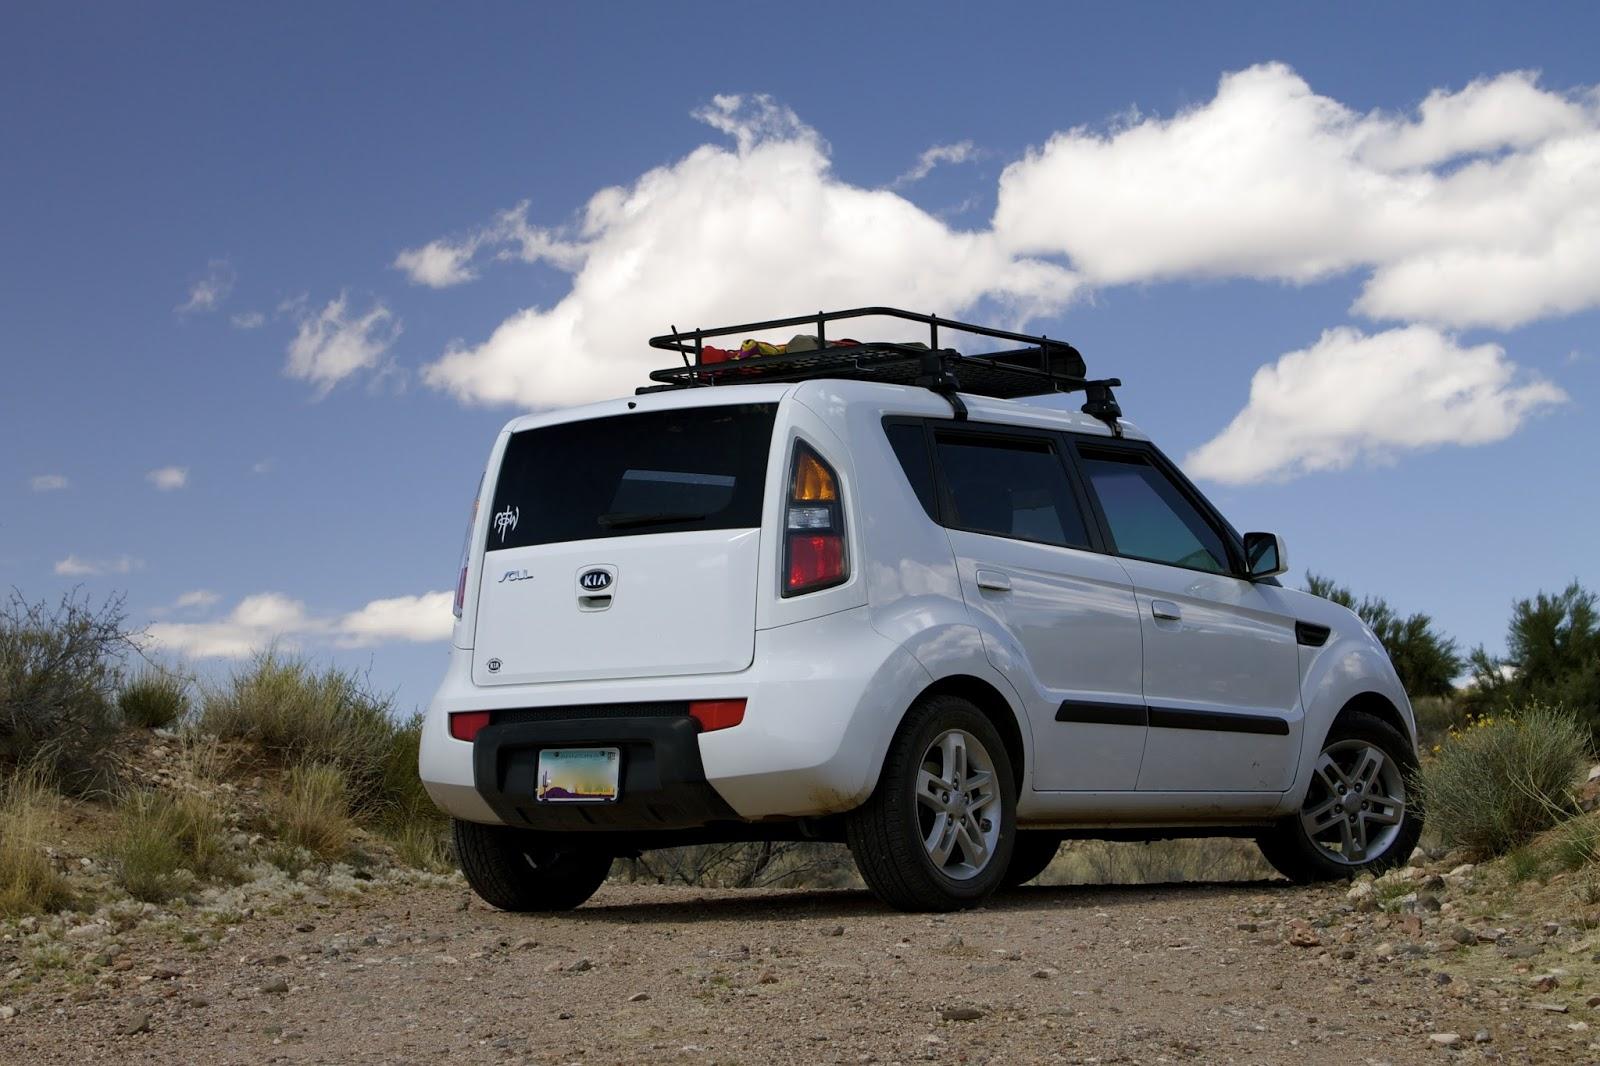 Pioneering Arizona: 2014